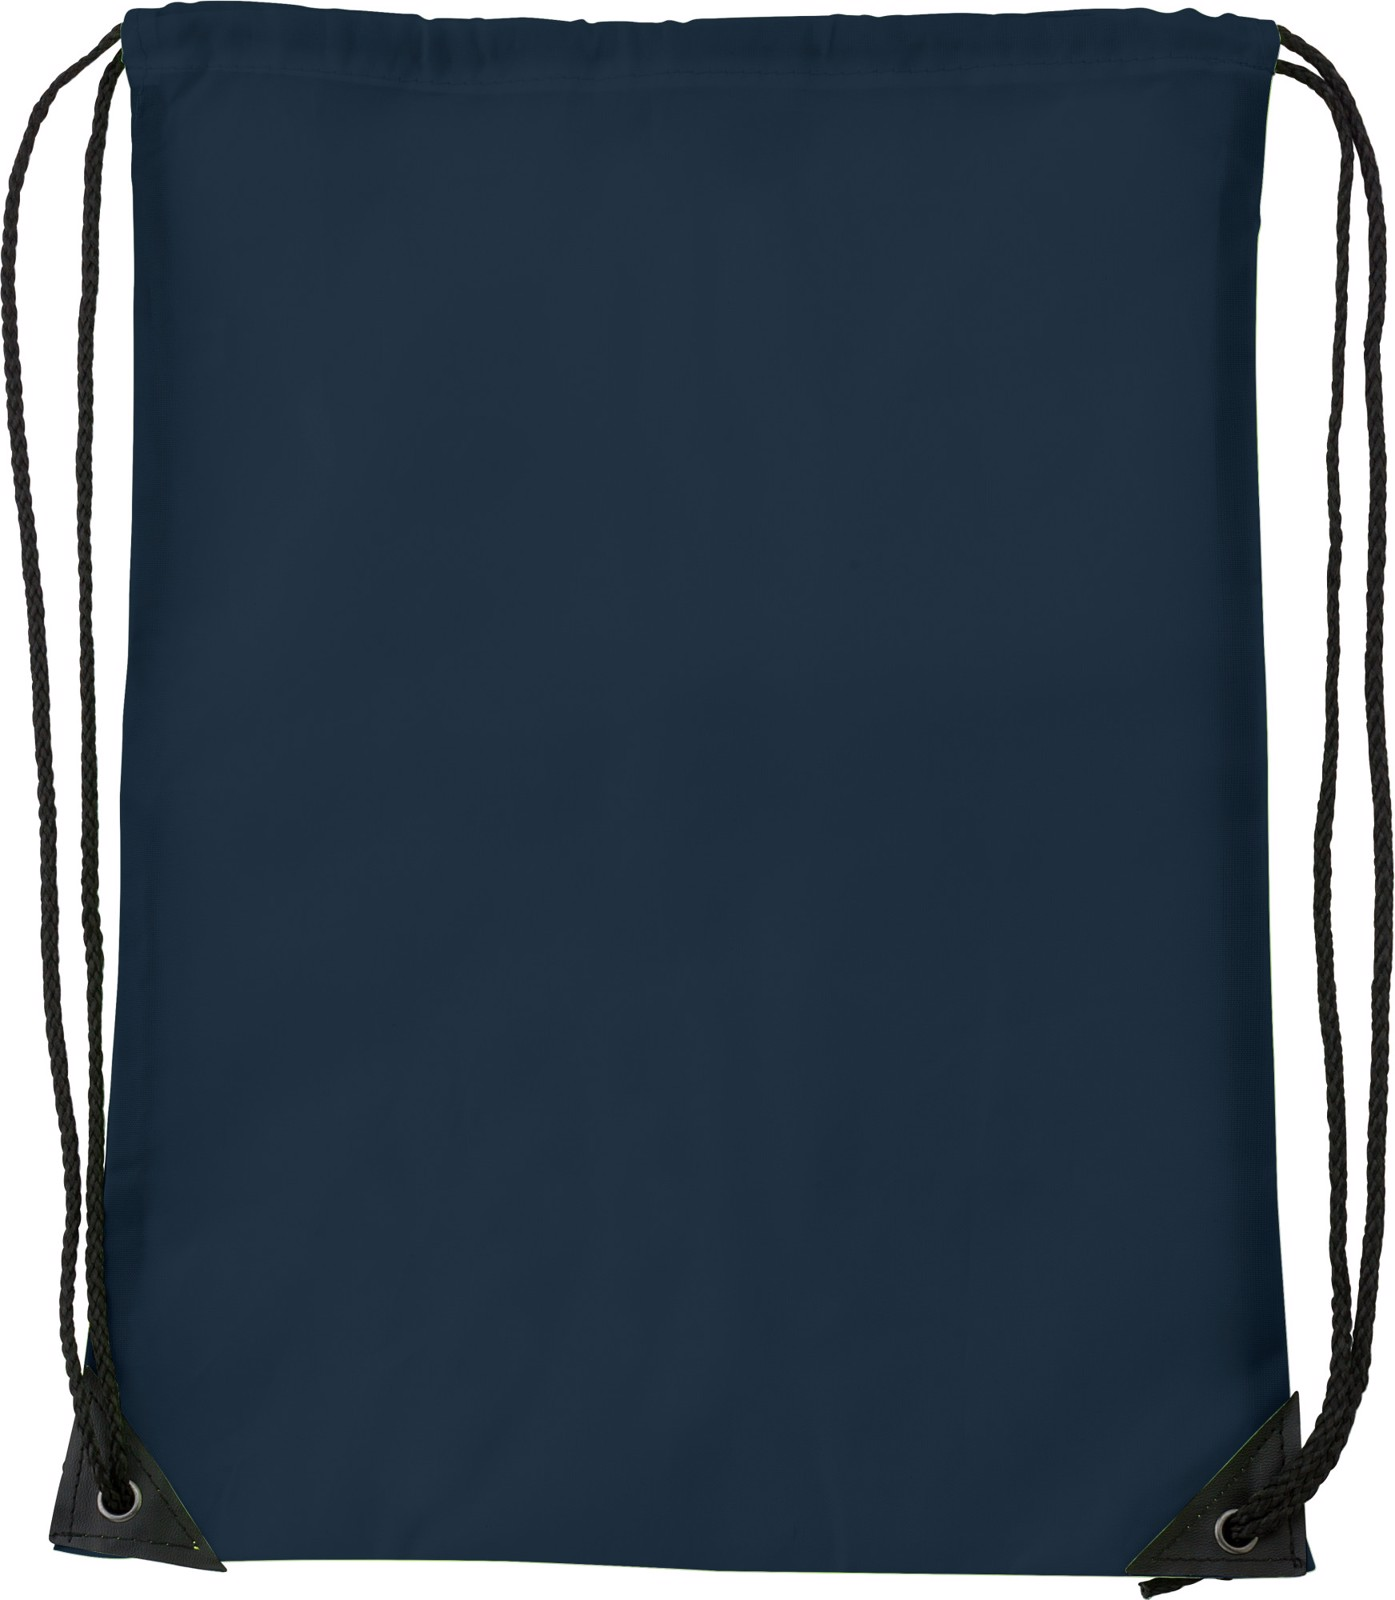 Polyester (210D) drawstring backpack - Blue